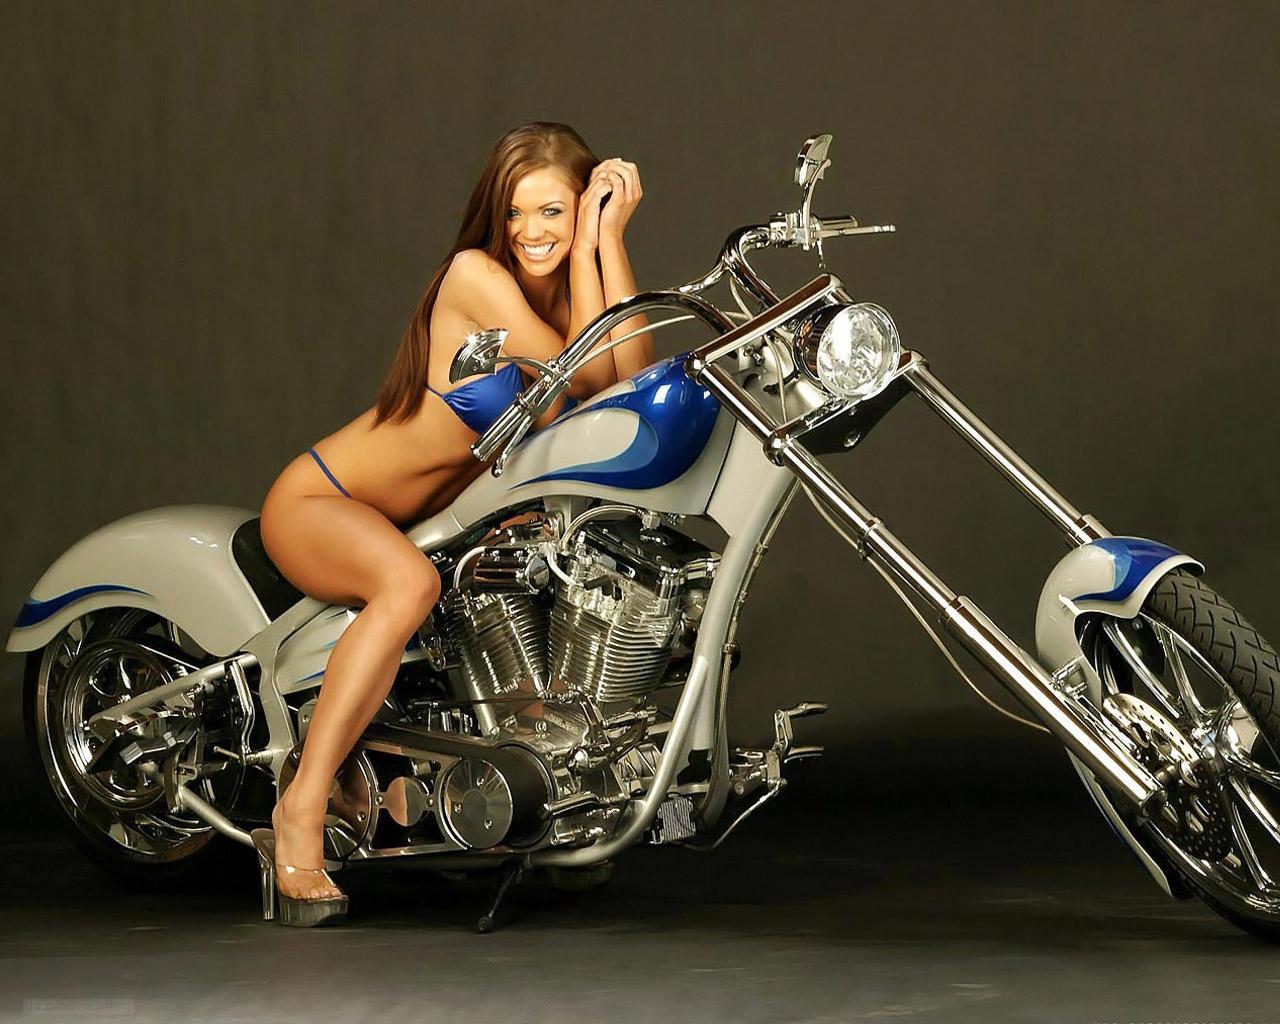 Album: Harley Davidson HD